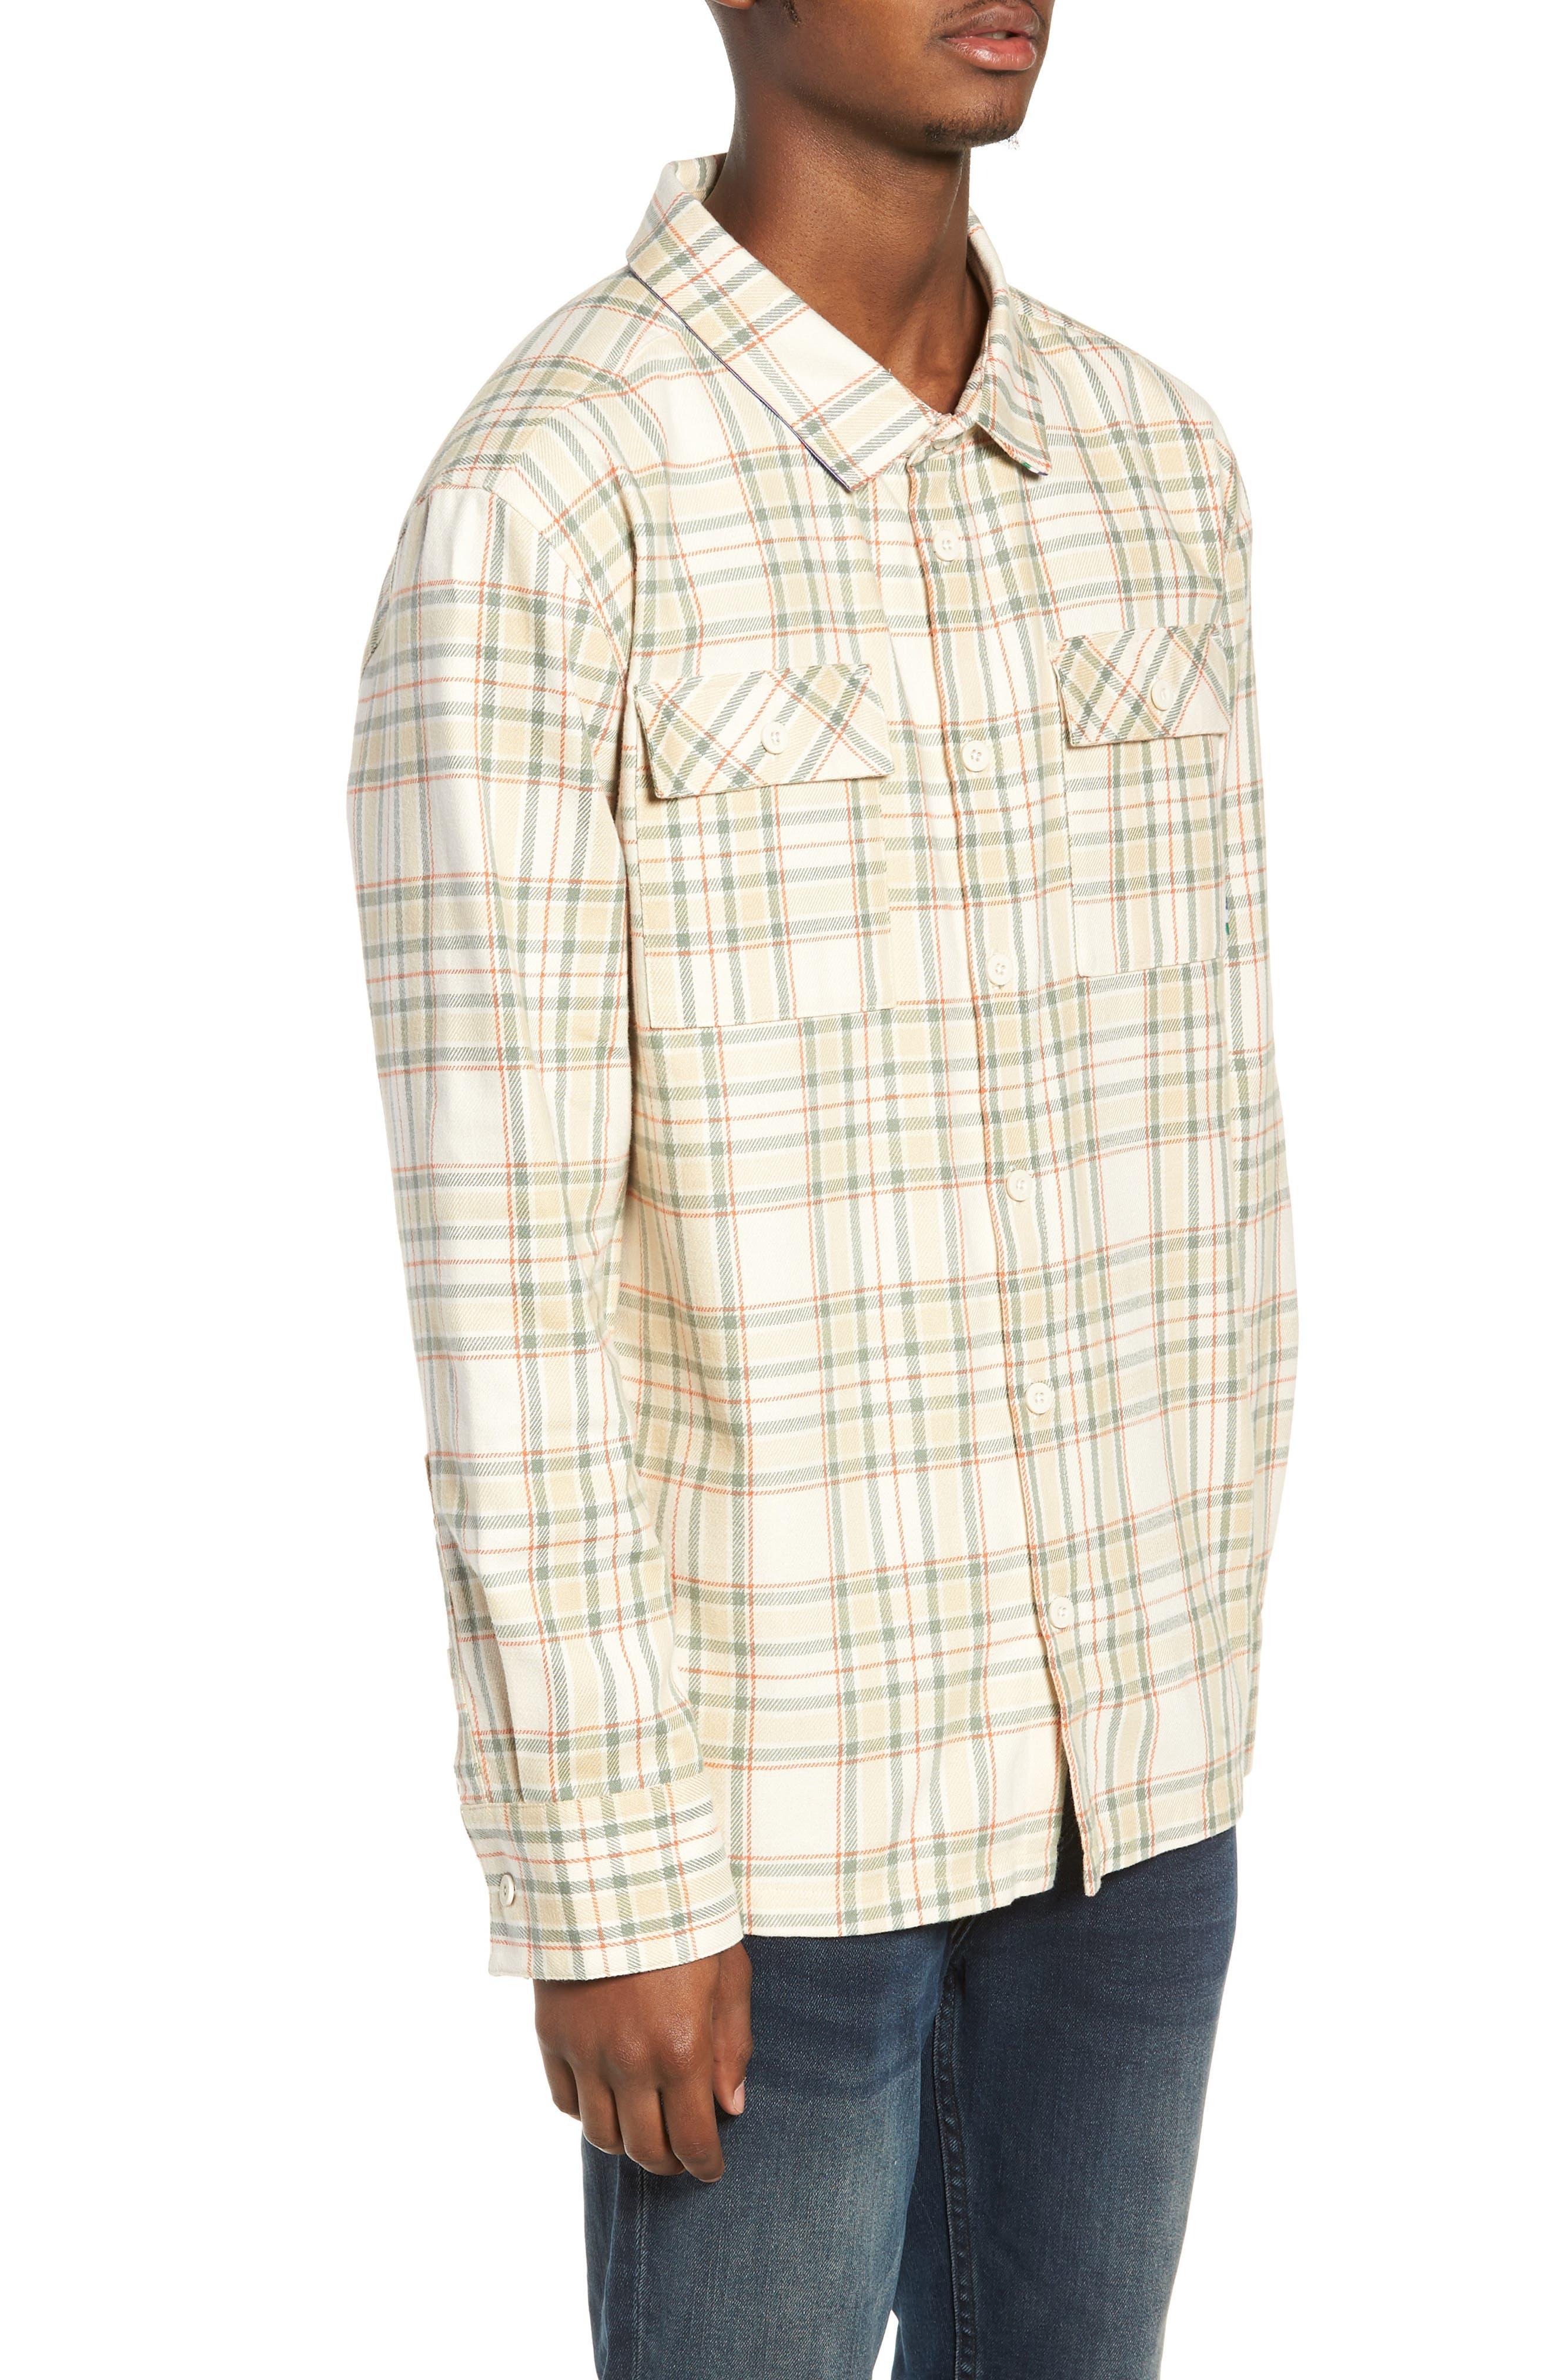 PUMA,                             x Big Sean Check Shirt,                             Alternate thumbnail 3, color,                             100